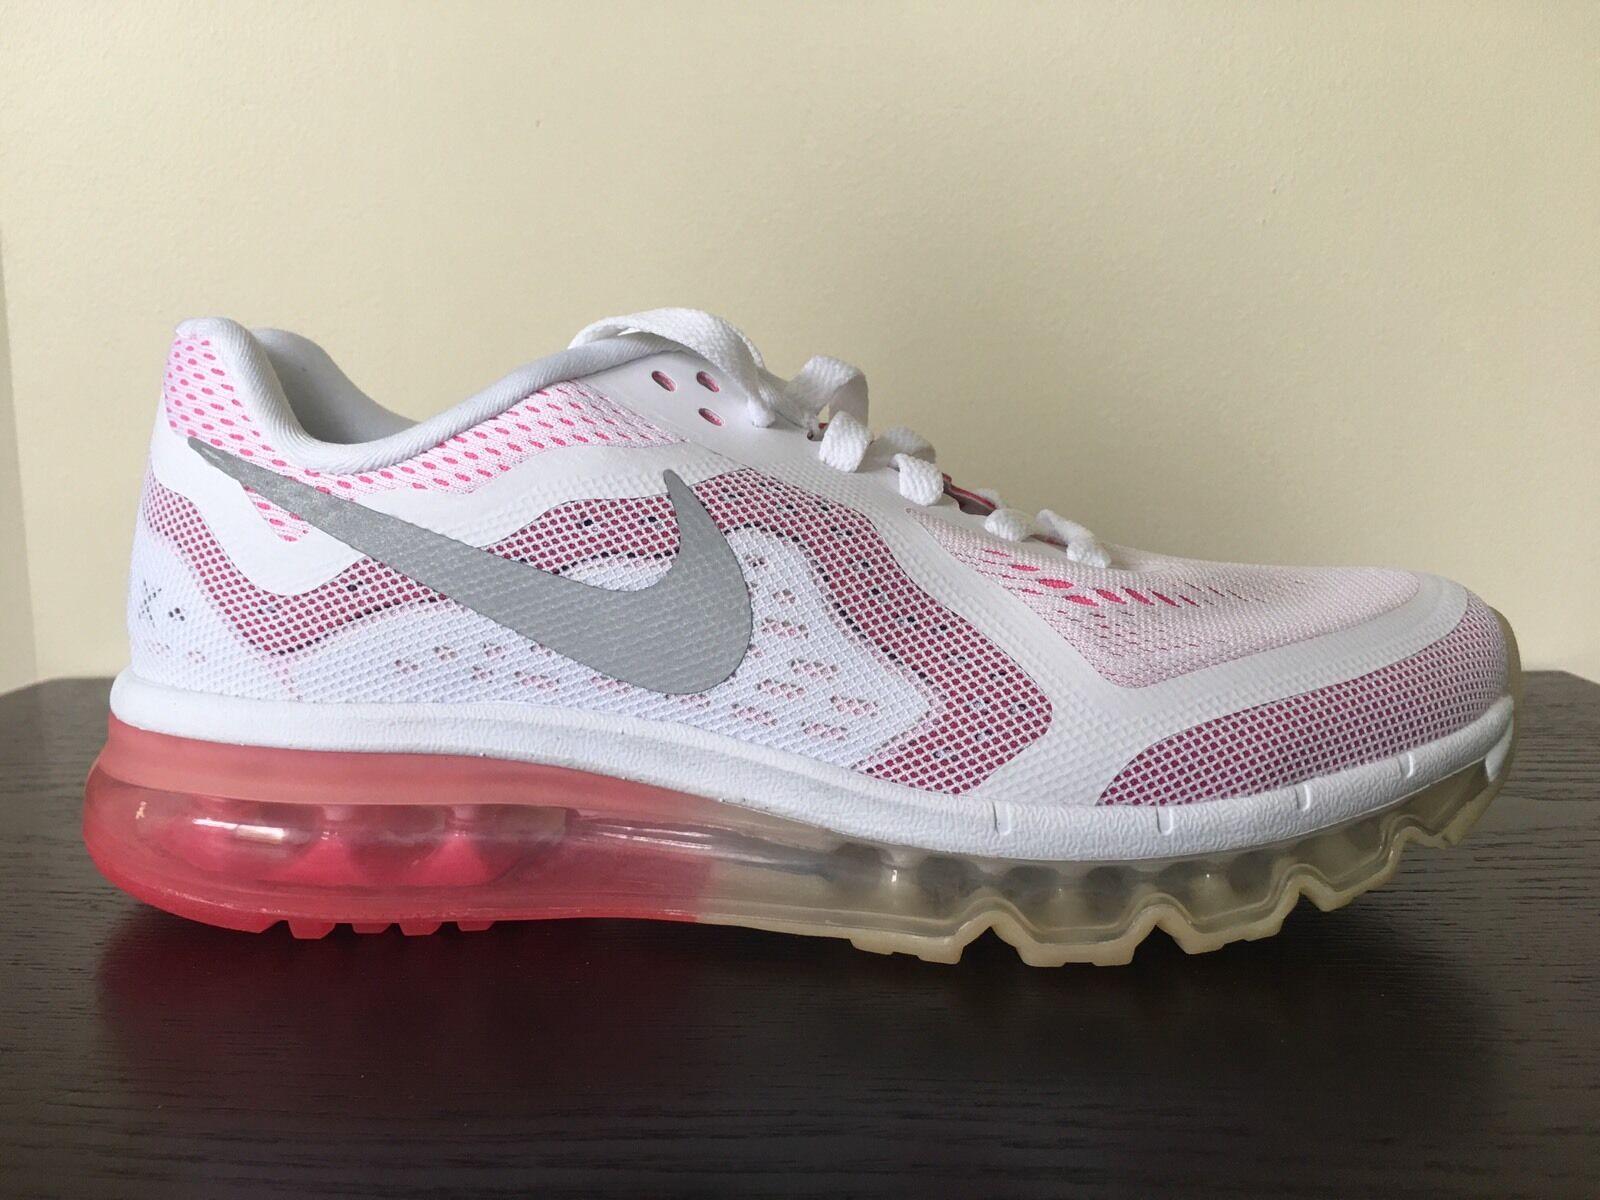 NEW Nike Air Max+ 2014 Womens Size 8.5 white/plum red pink 621078 106 NIB